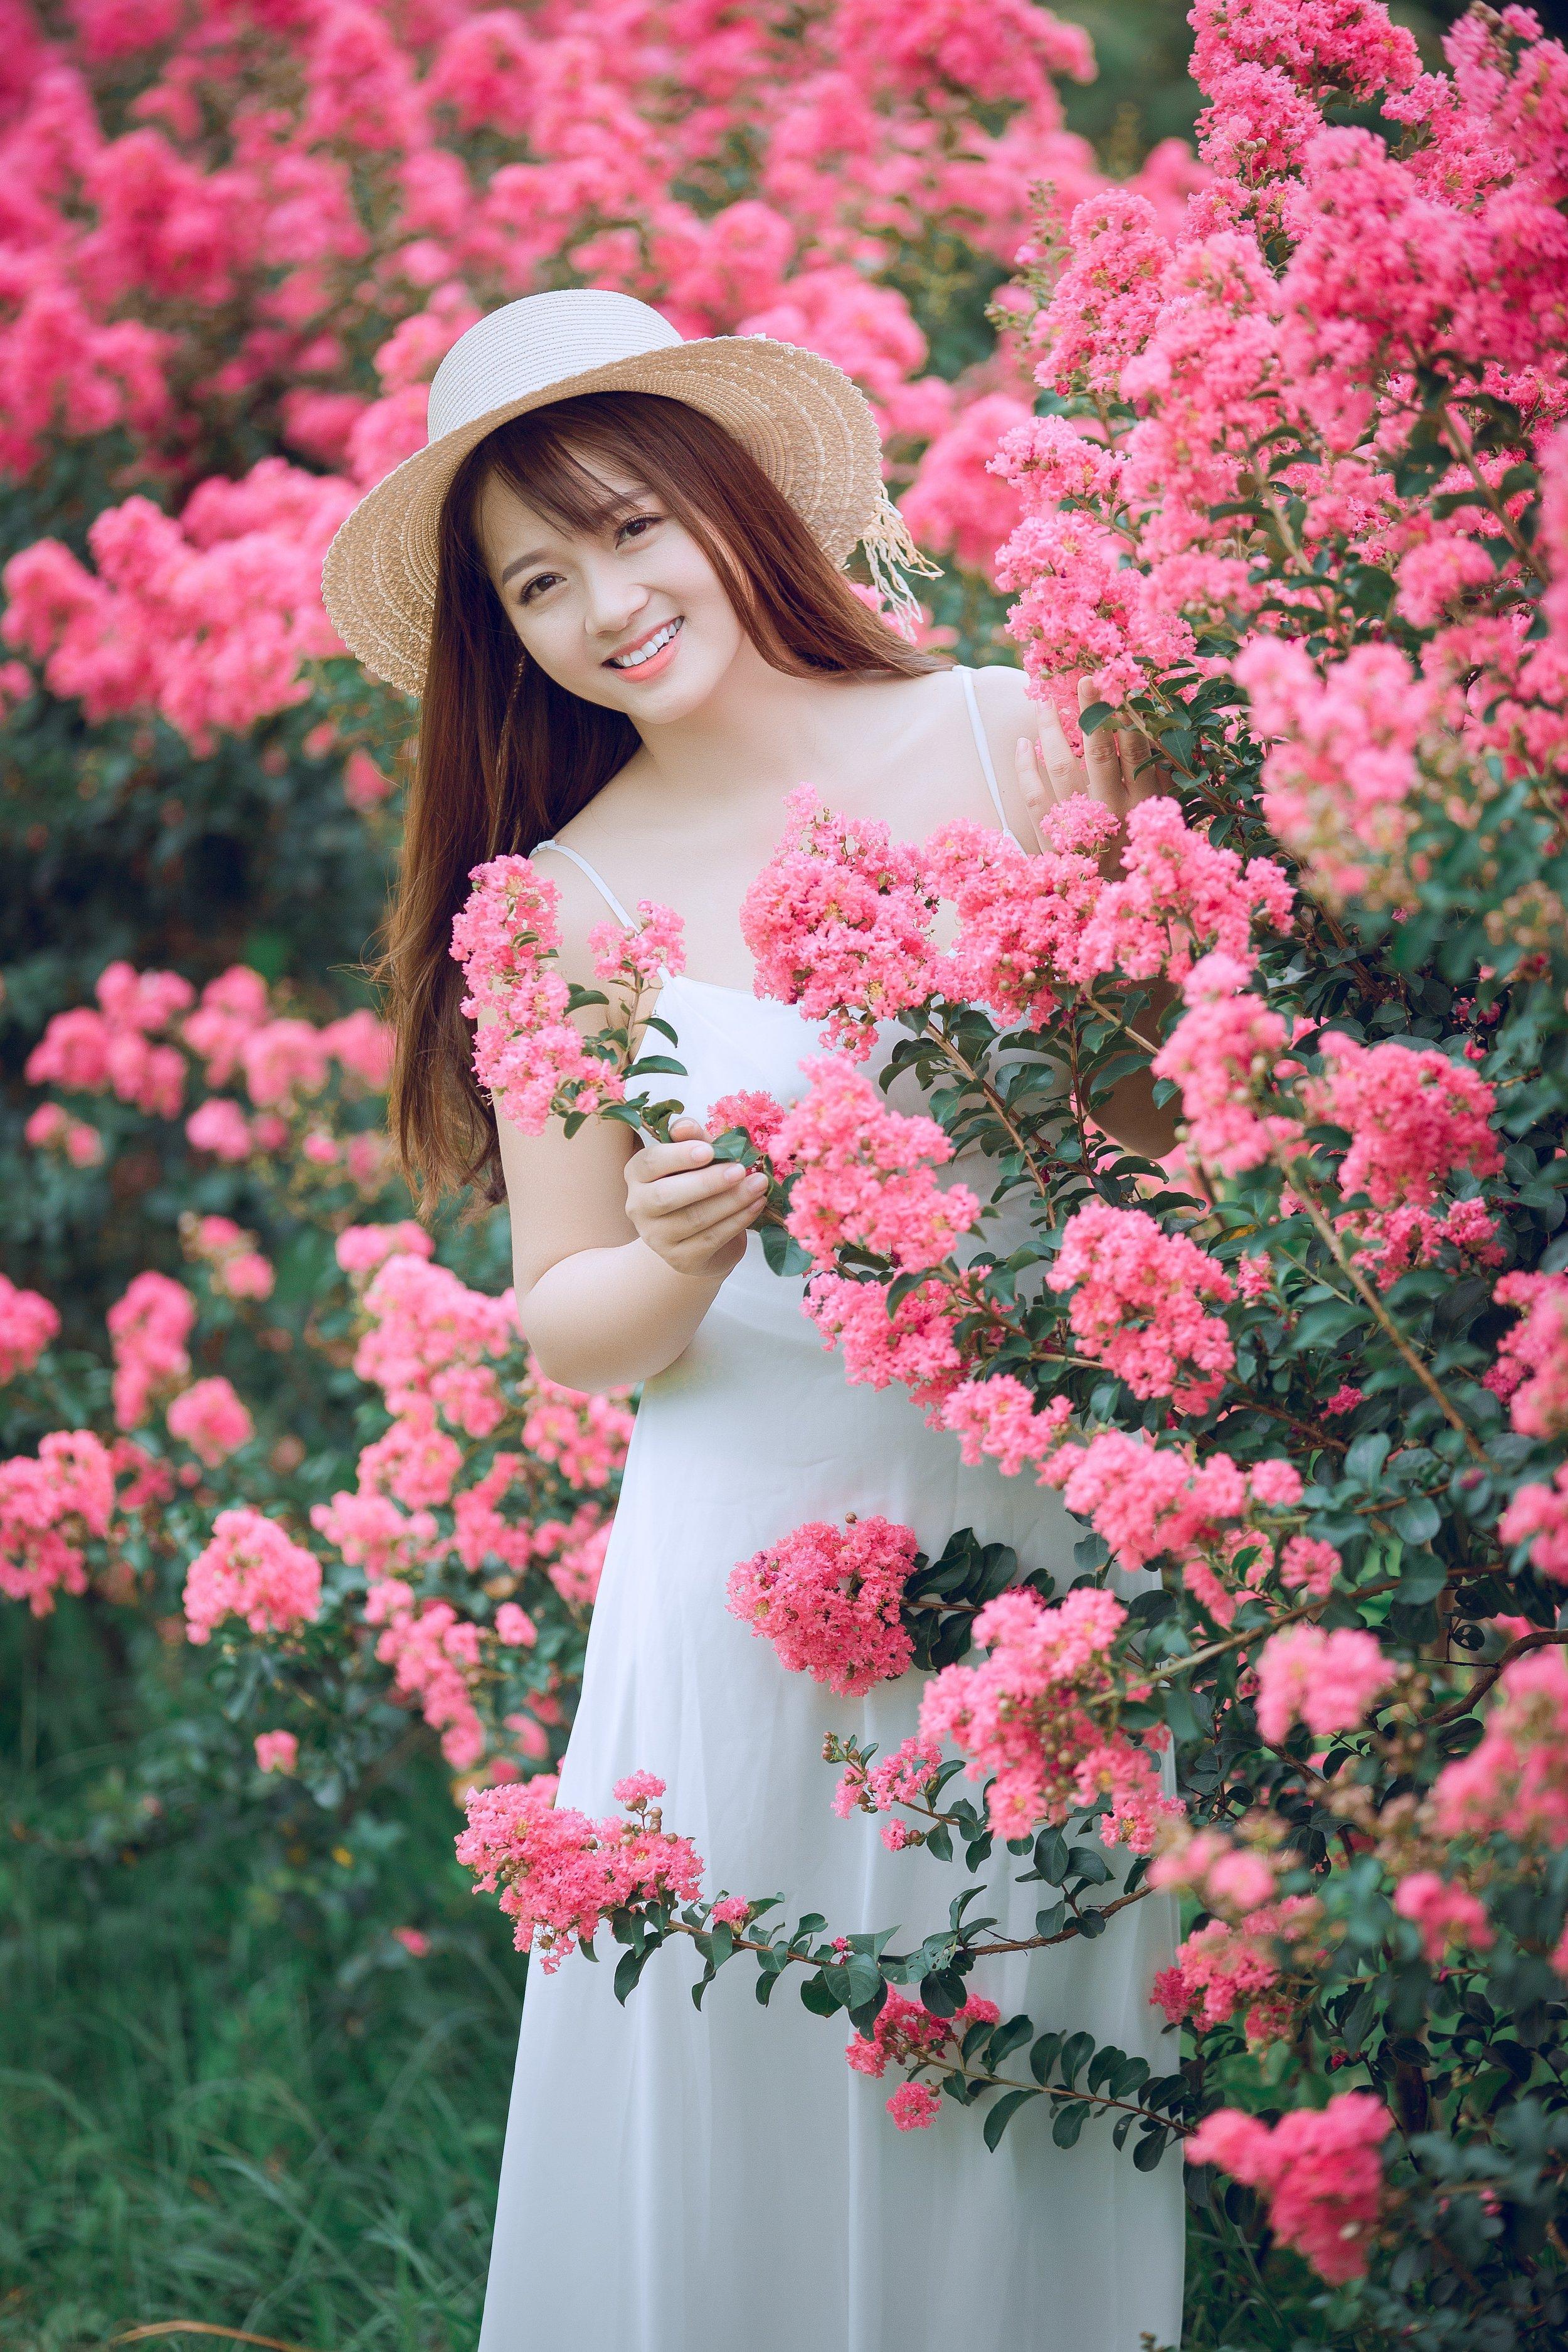 beautiful-bloom-blossom-1406766.jpg